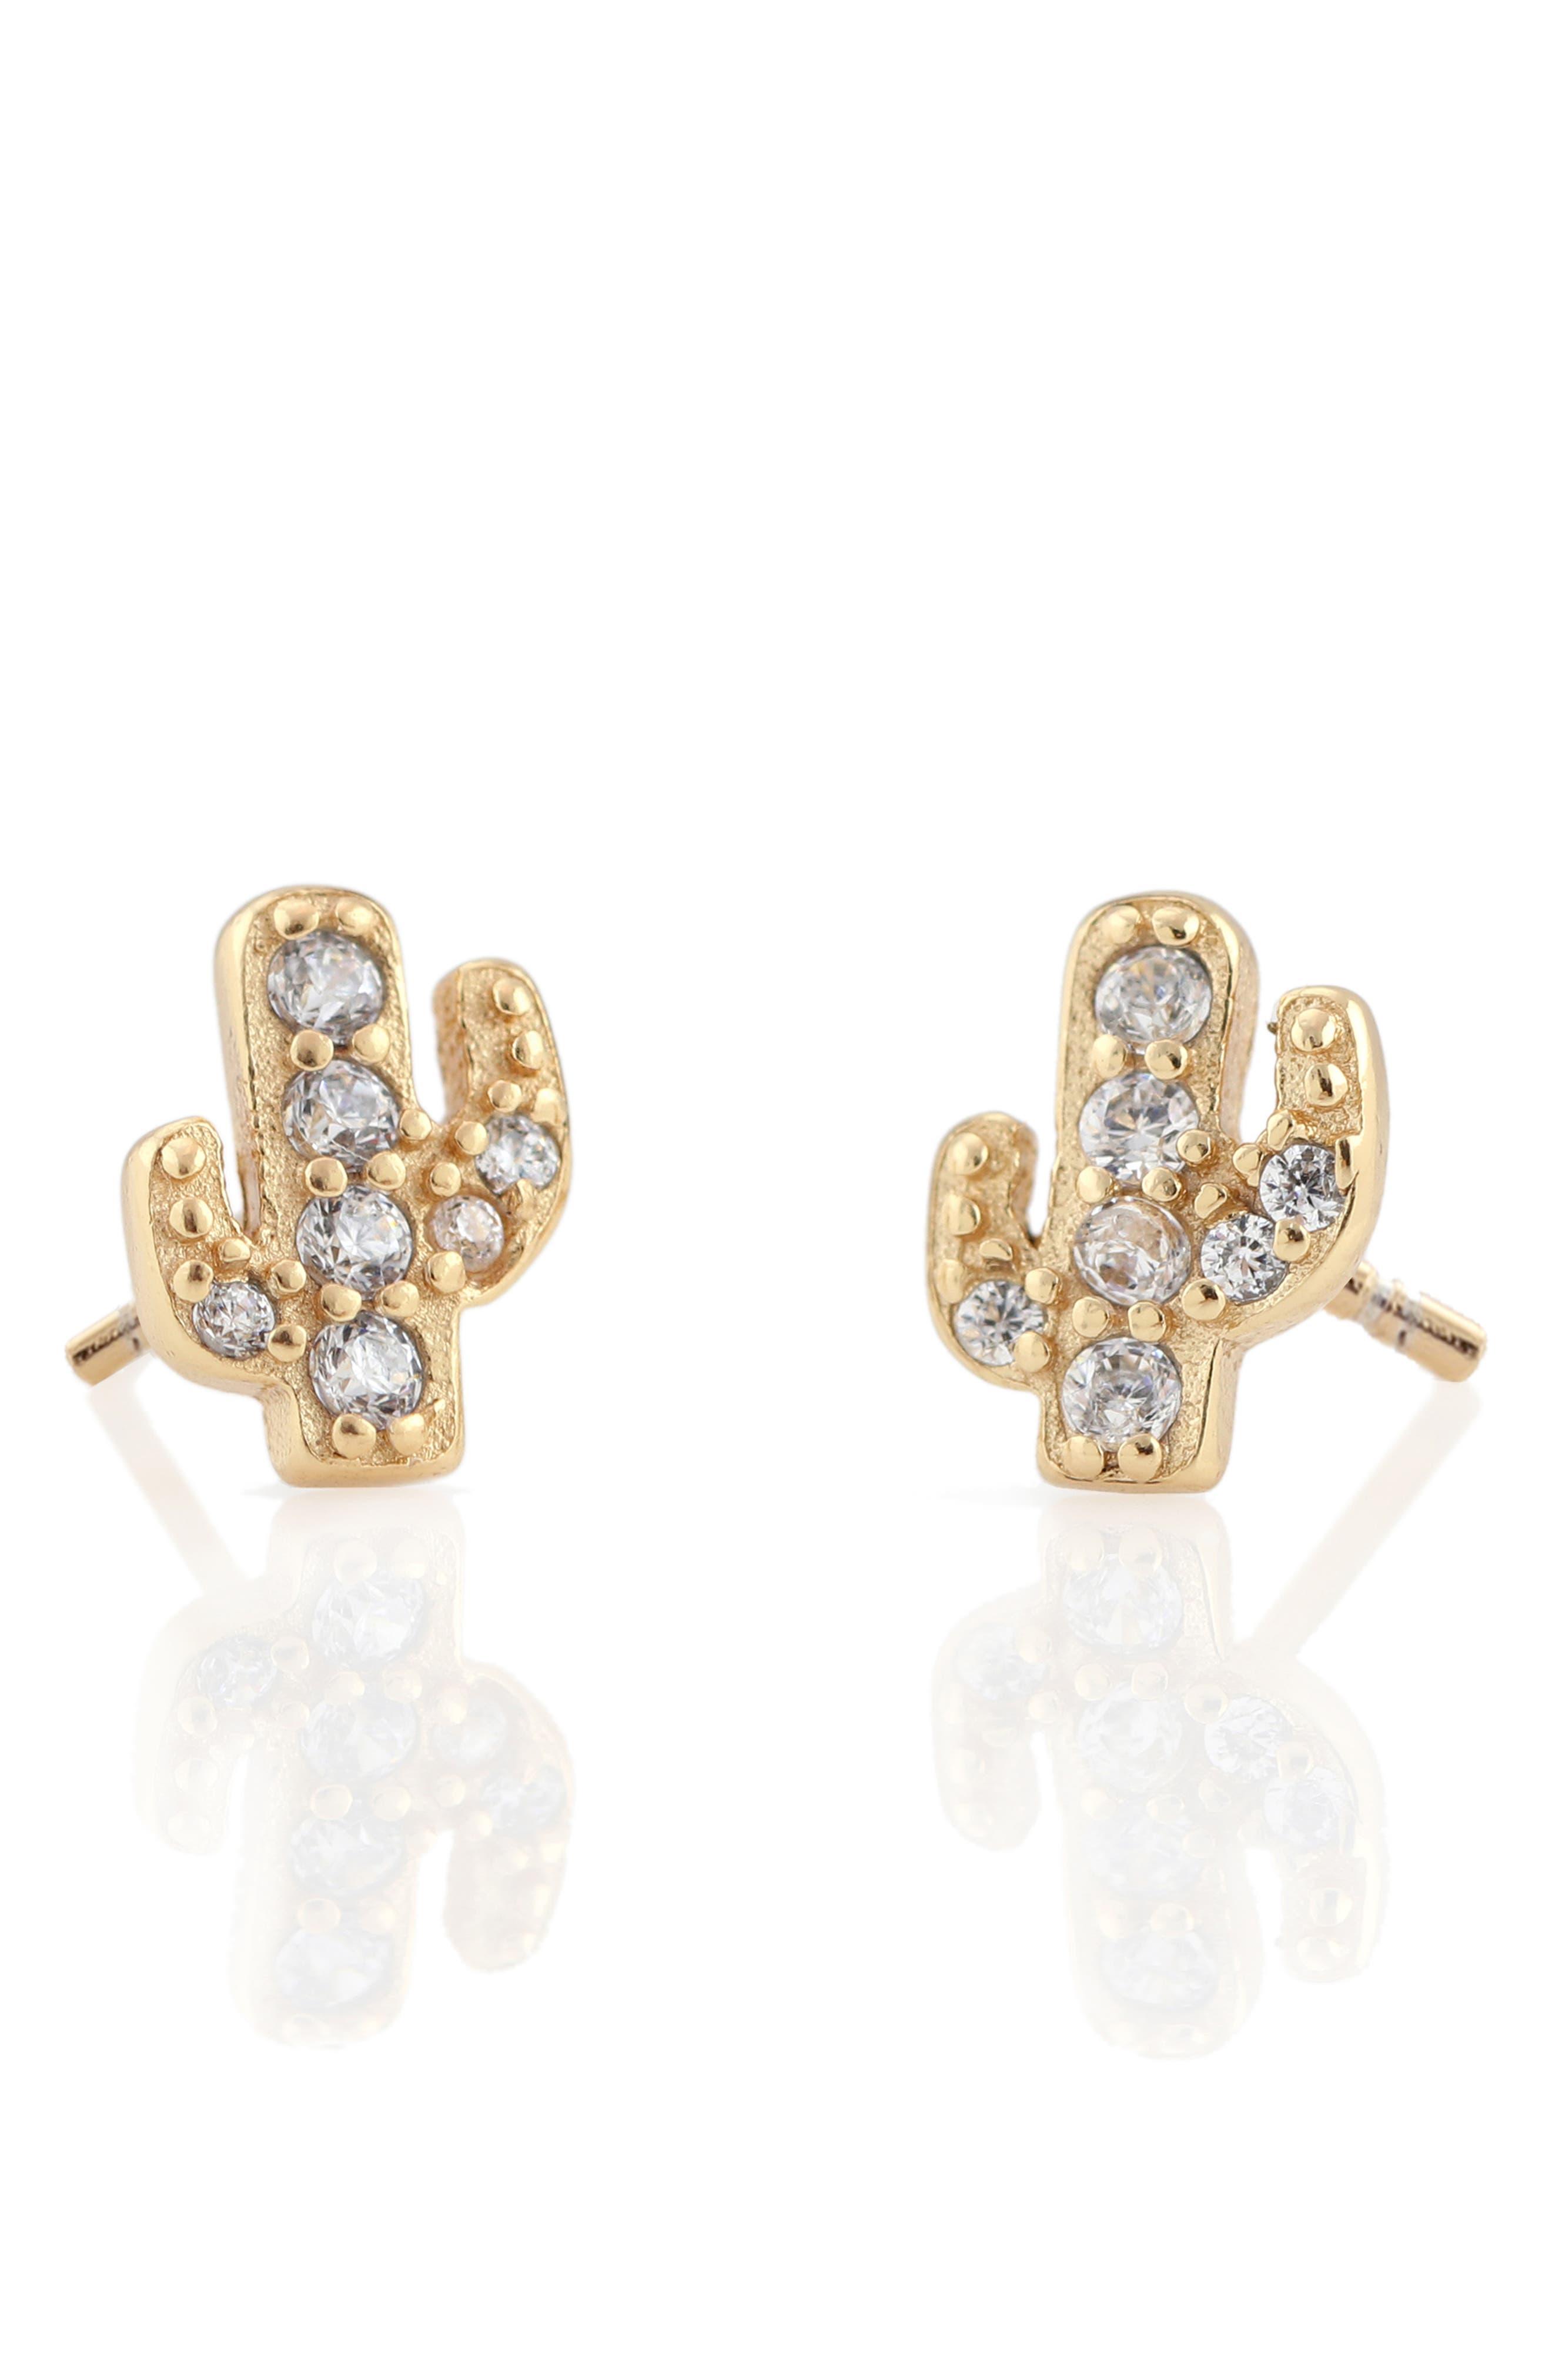 Pavé Cactus Stud Earrings,                             Main thumbnail 1, color,                             Gold